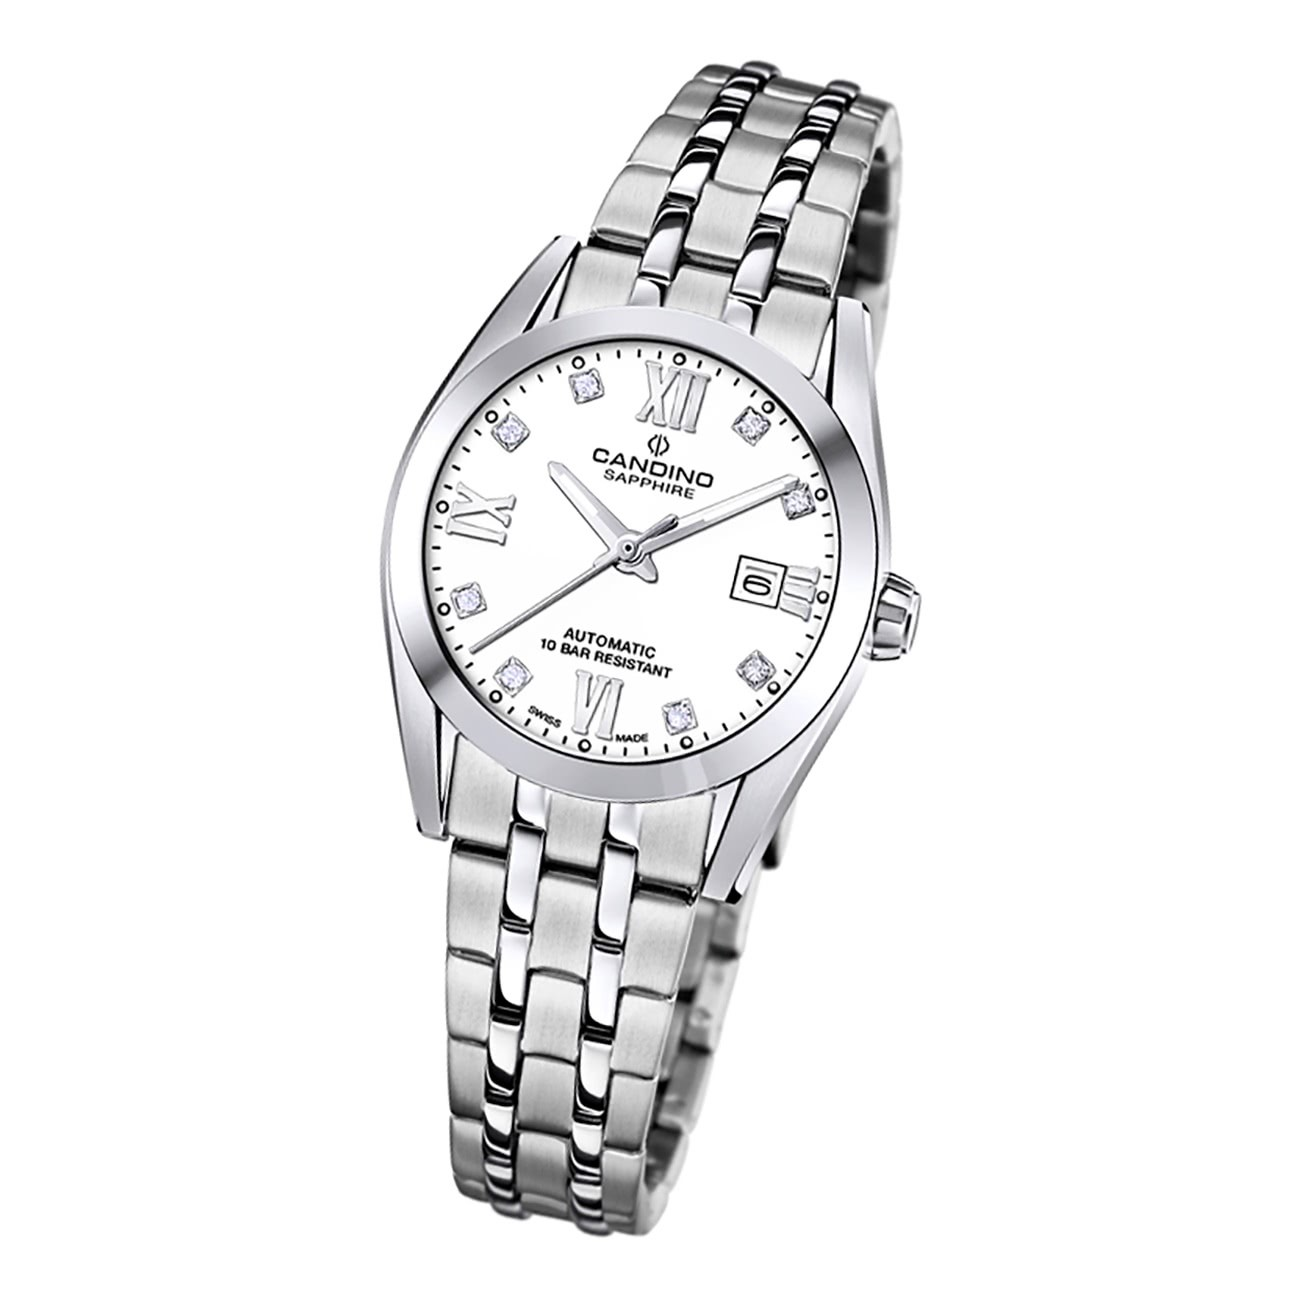 Candino Damen Armbanduhr Automatik C4703/1 Analog Edelstahl silber UC4703/1